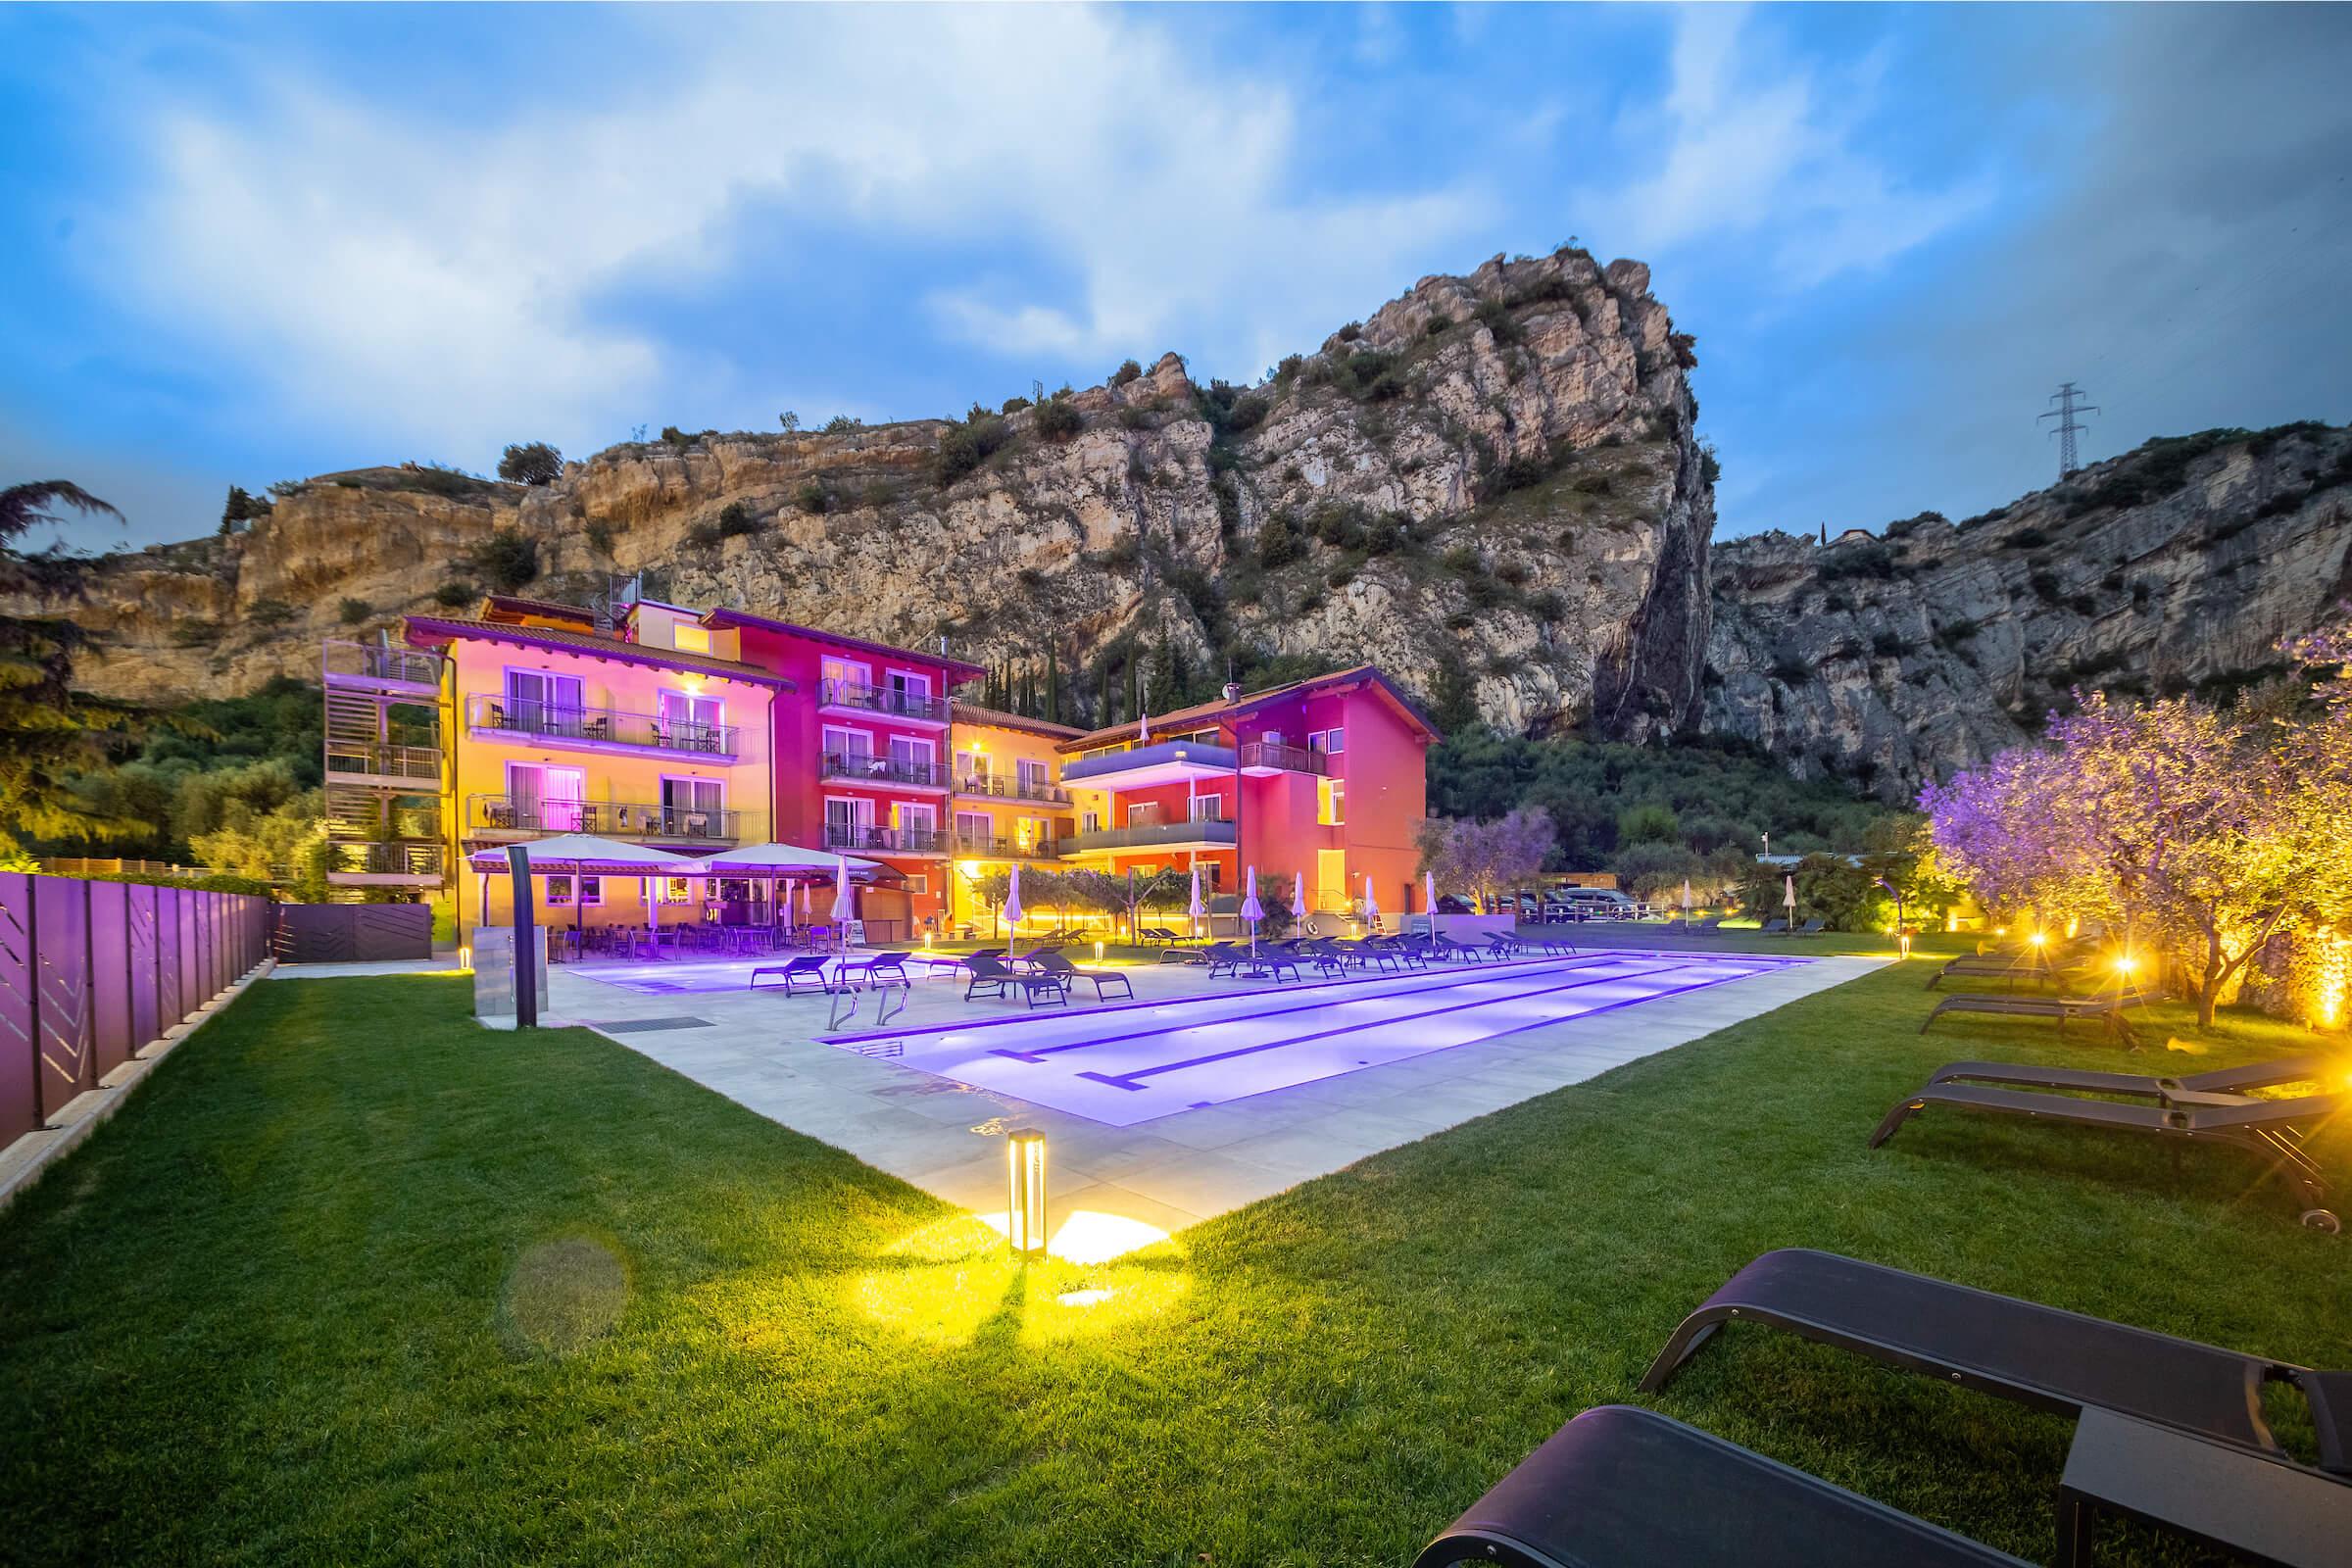 Hotel Santalucia in Torbule sul Garda